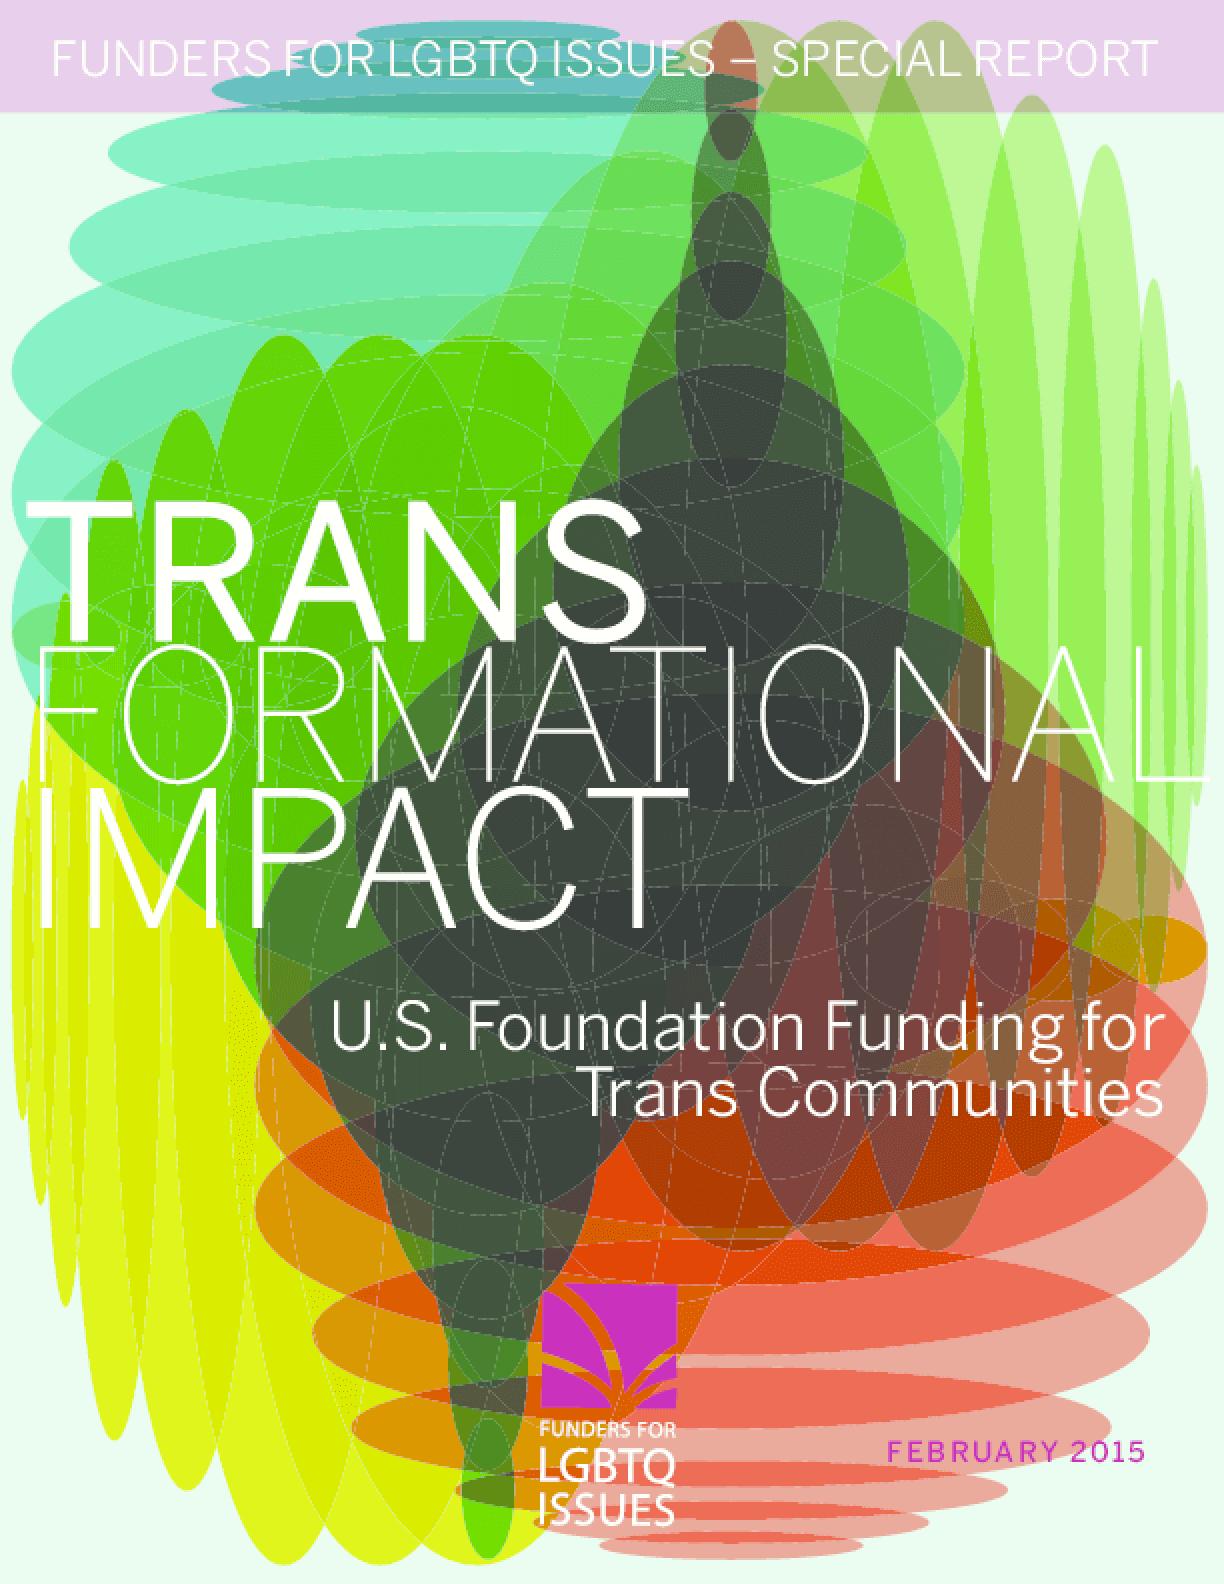 Transformational Impact: U.S. Foundation Funding for Trans Communities